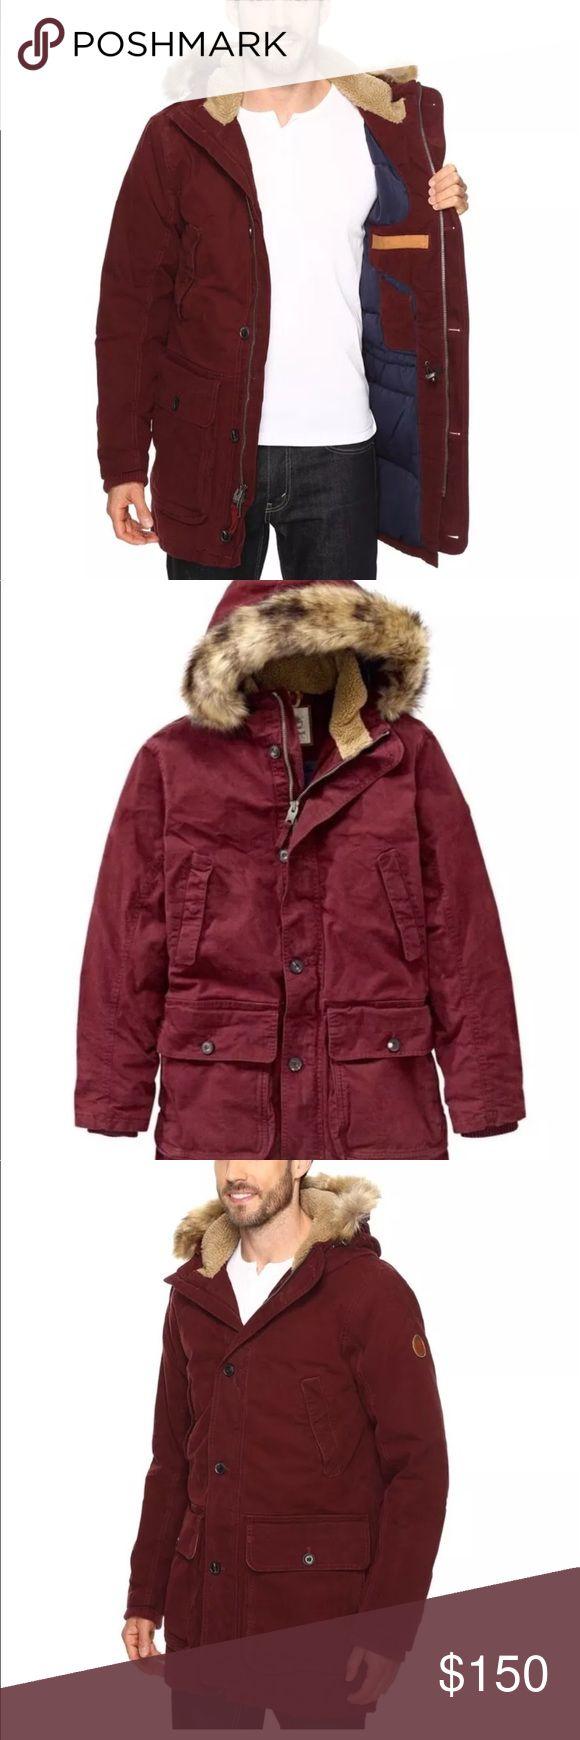 Men's TIMBERLAND winter coat $398 Timberland Men's Scar Ridge Waxed Canvas Down Parka Dark Port A1CDI Timberland Jackets & Coats